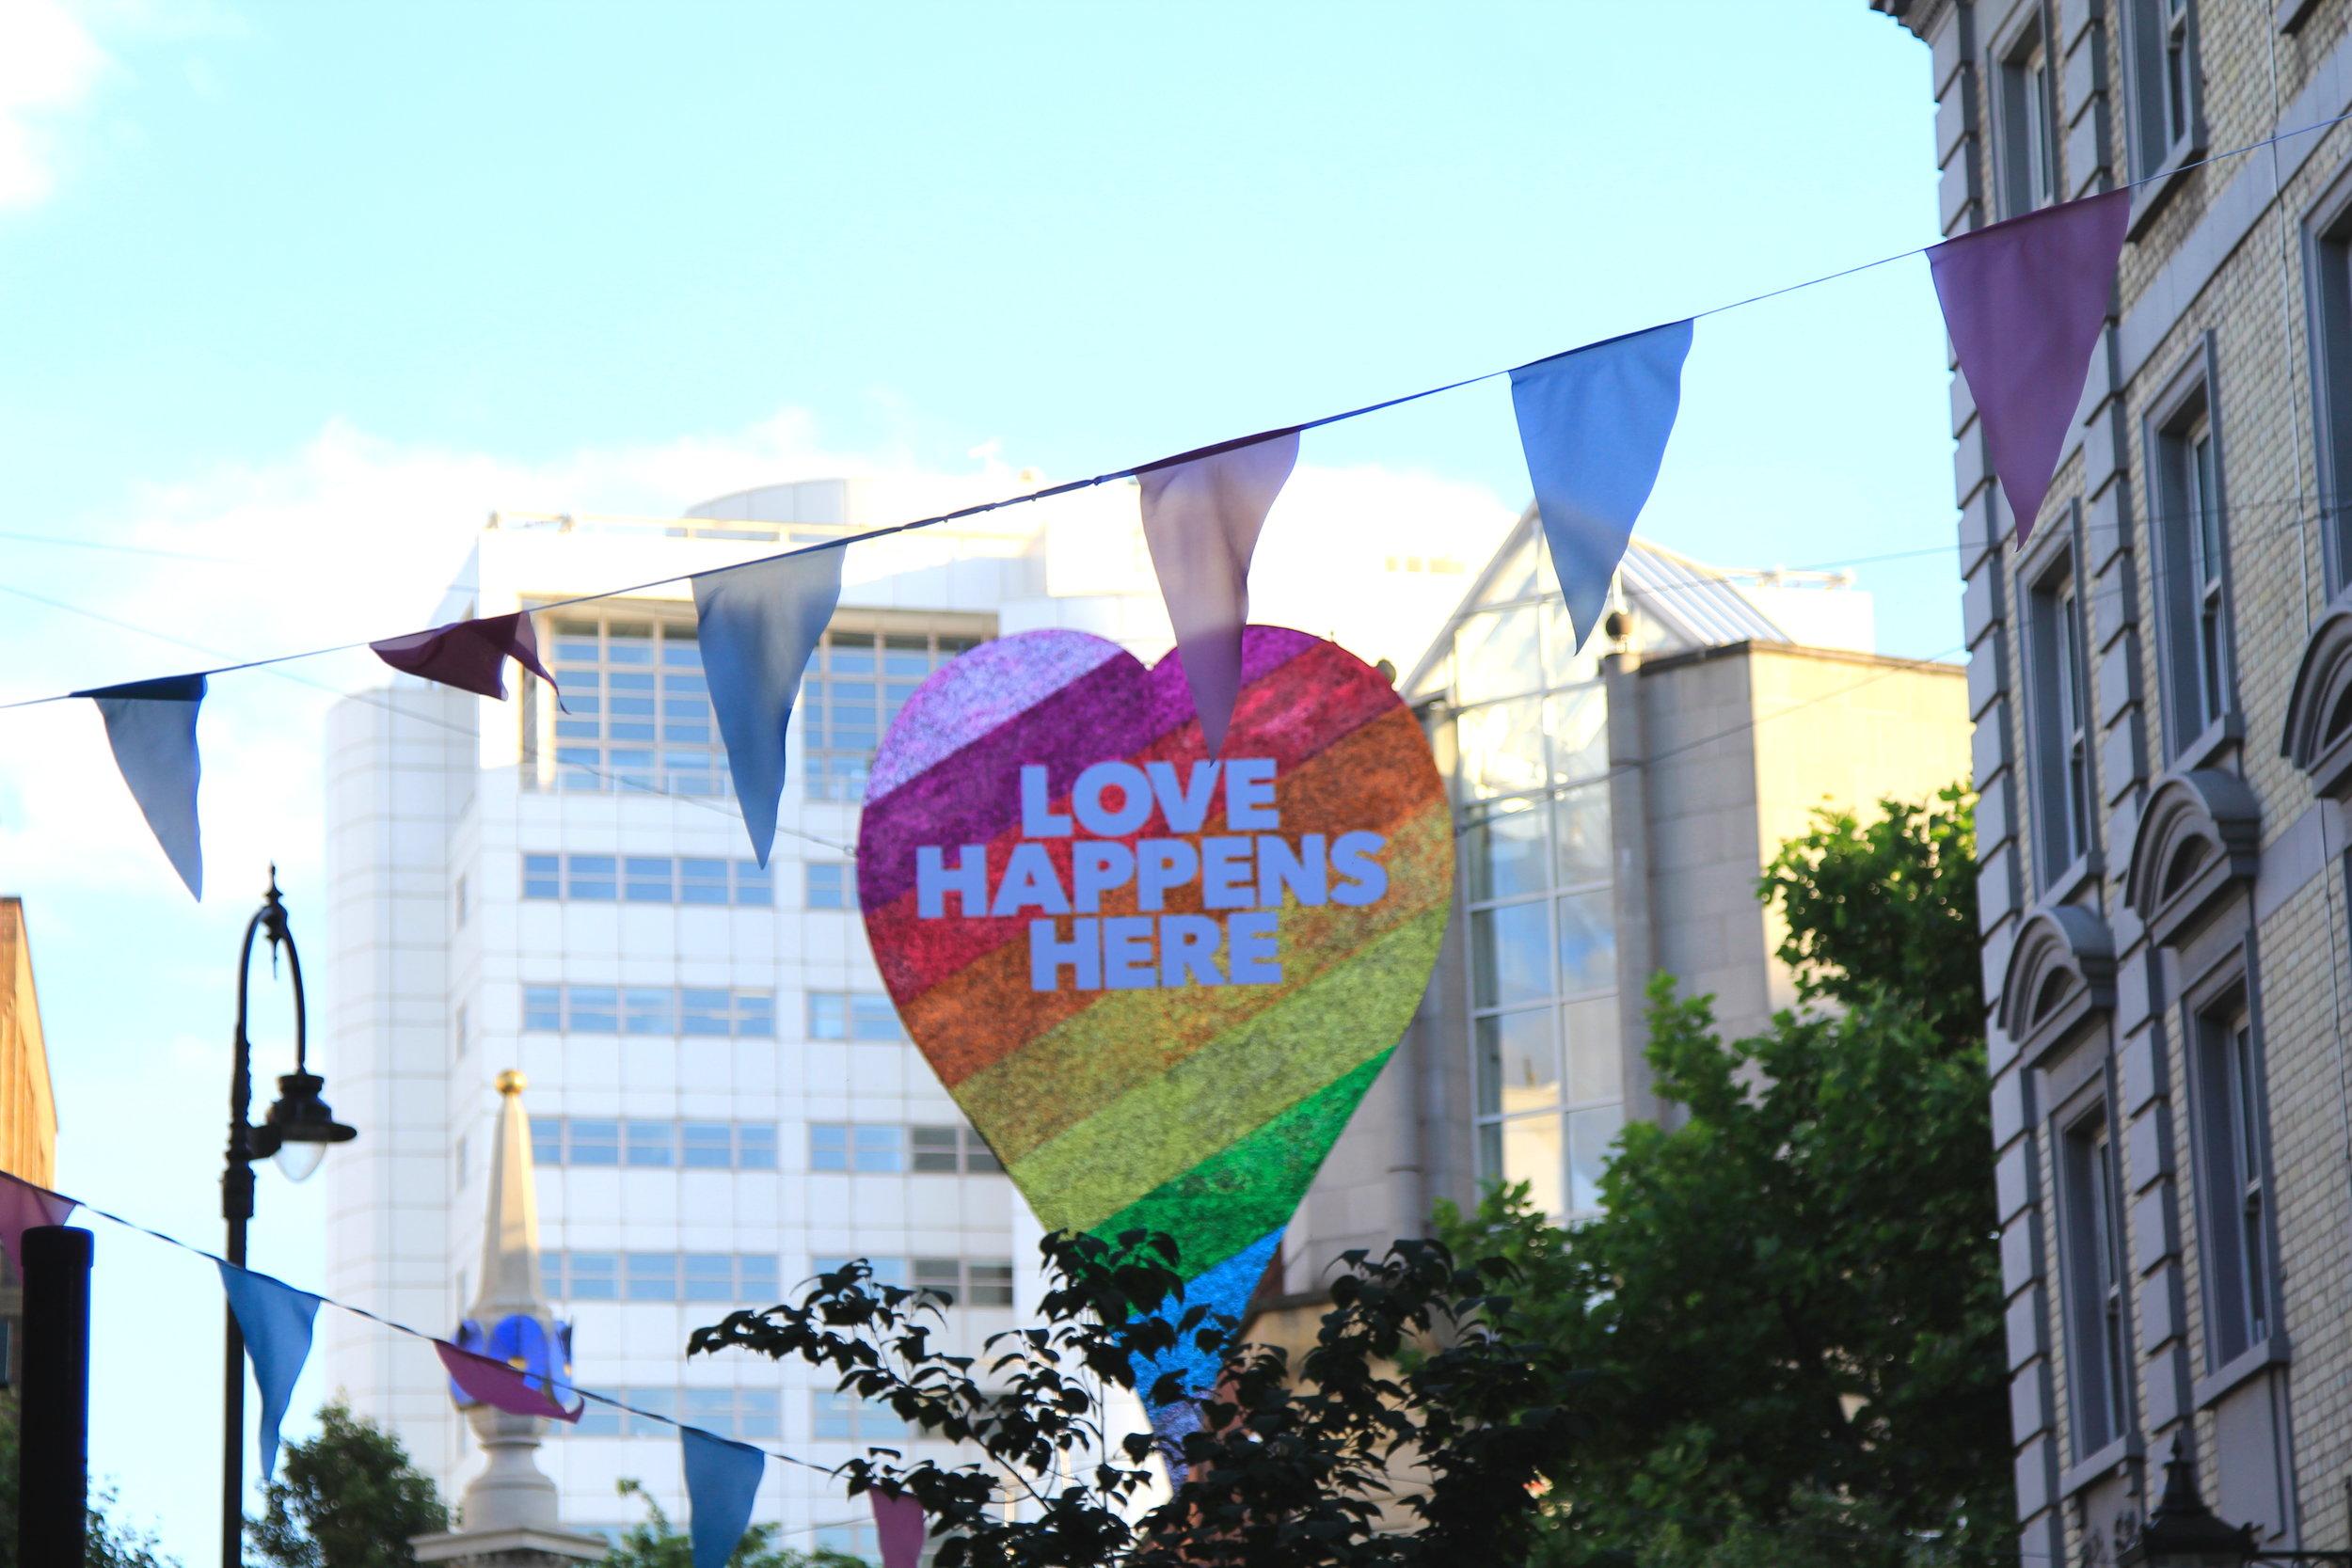 Love Happens in London